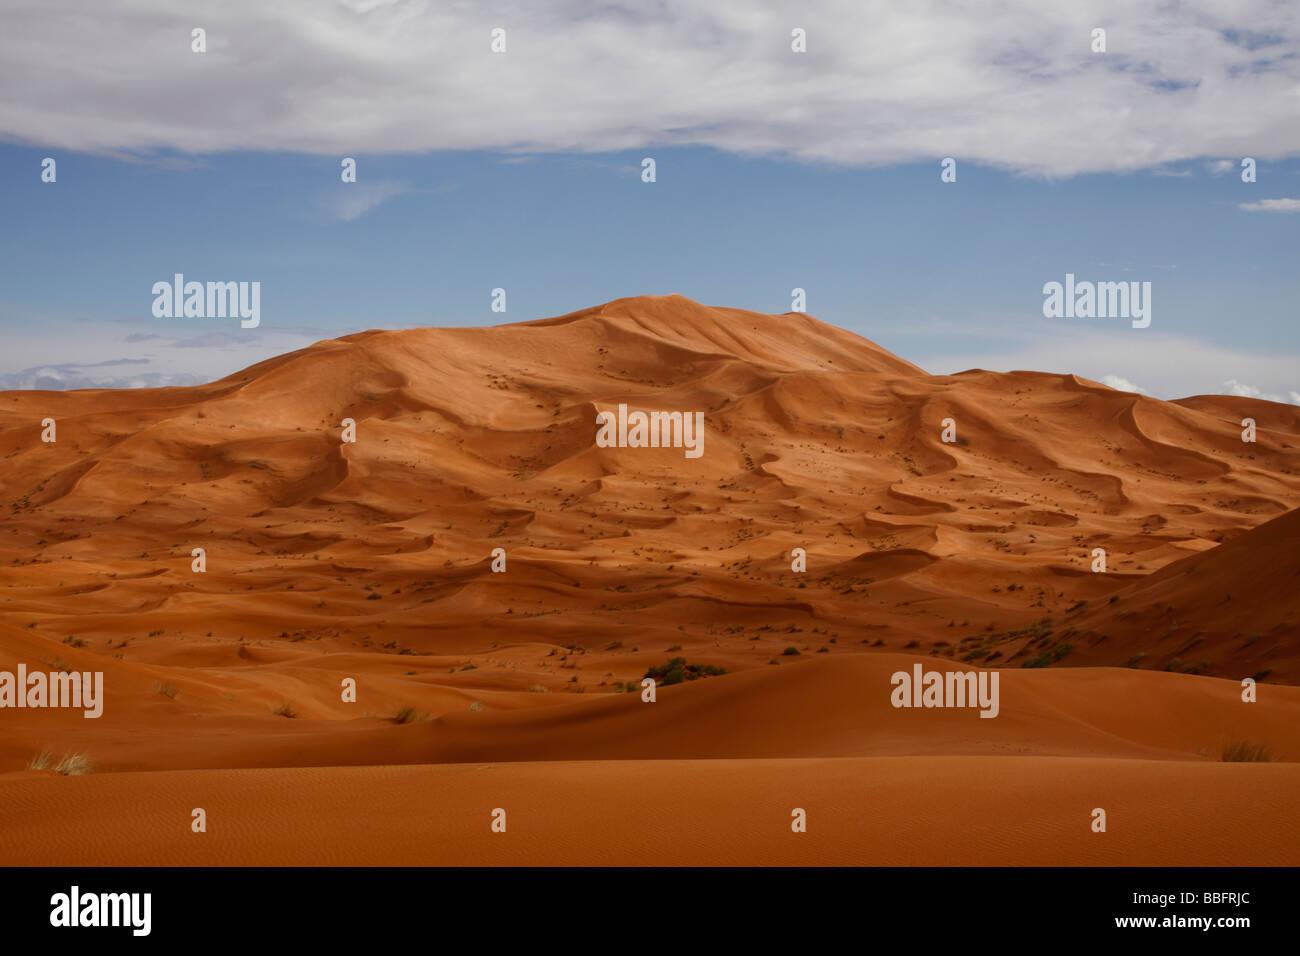 Africa, North Africa, Morocco, Sahara Desert, Merzouga, Erg Chebbi Stock Photo